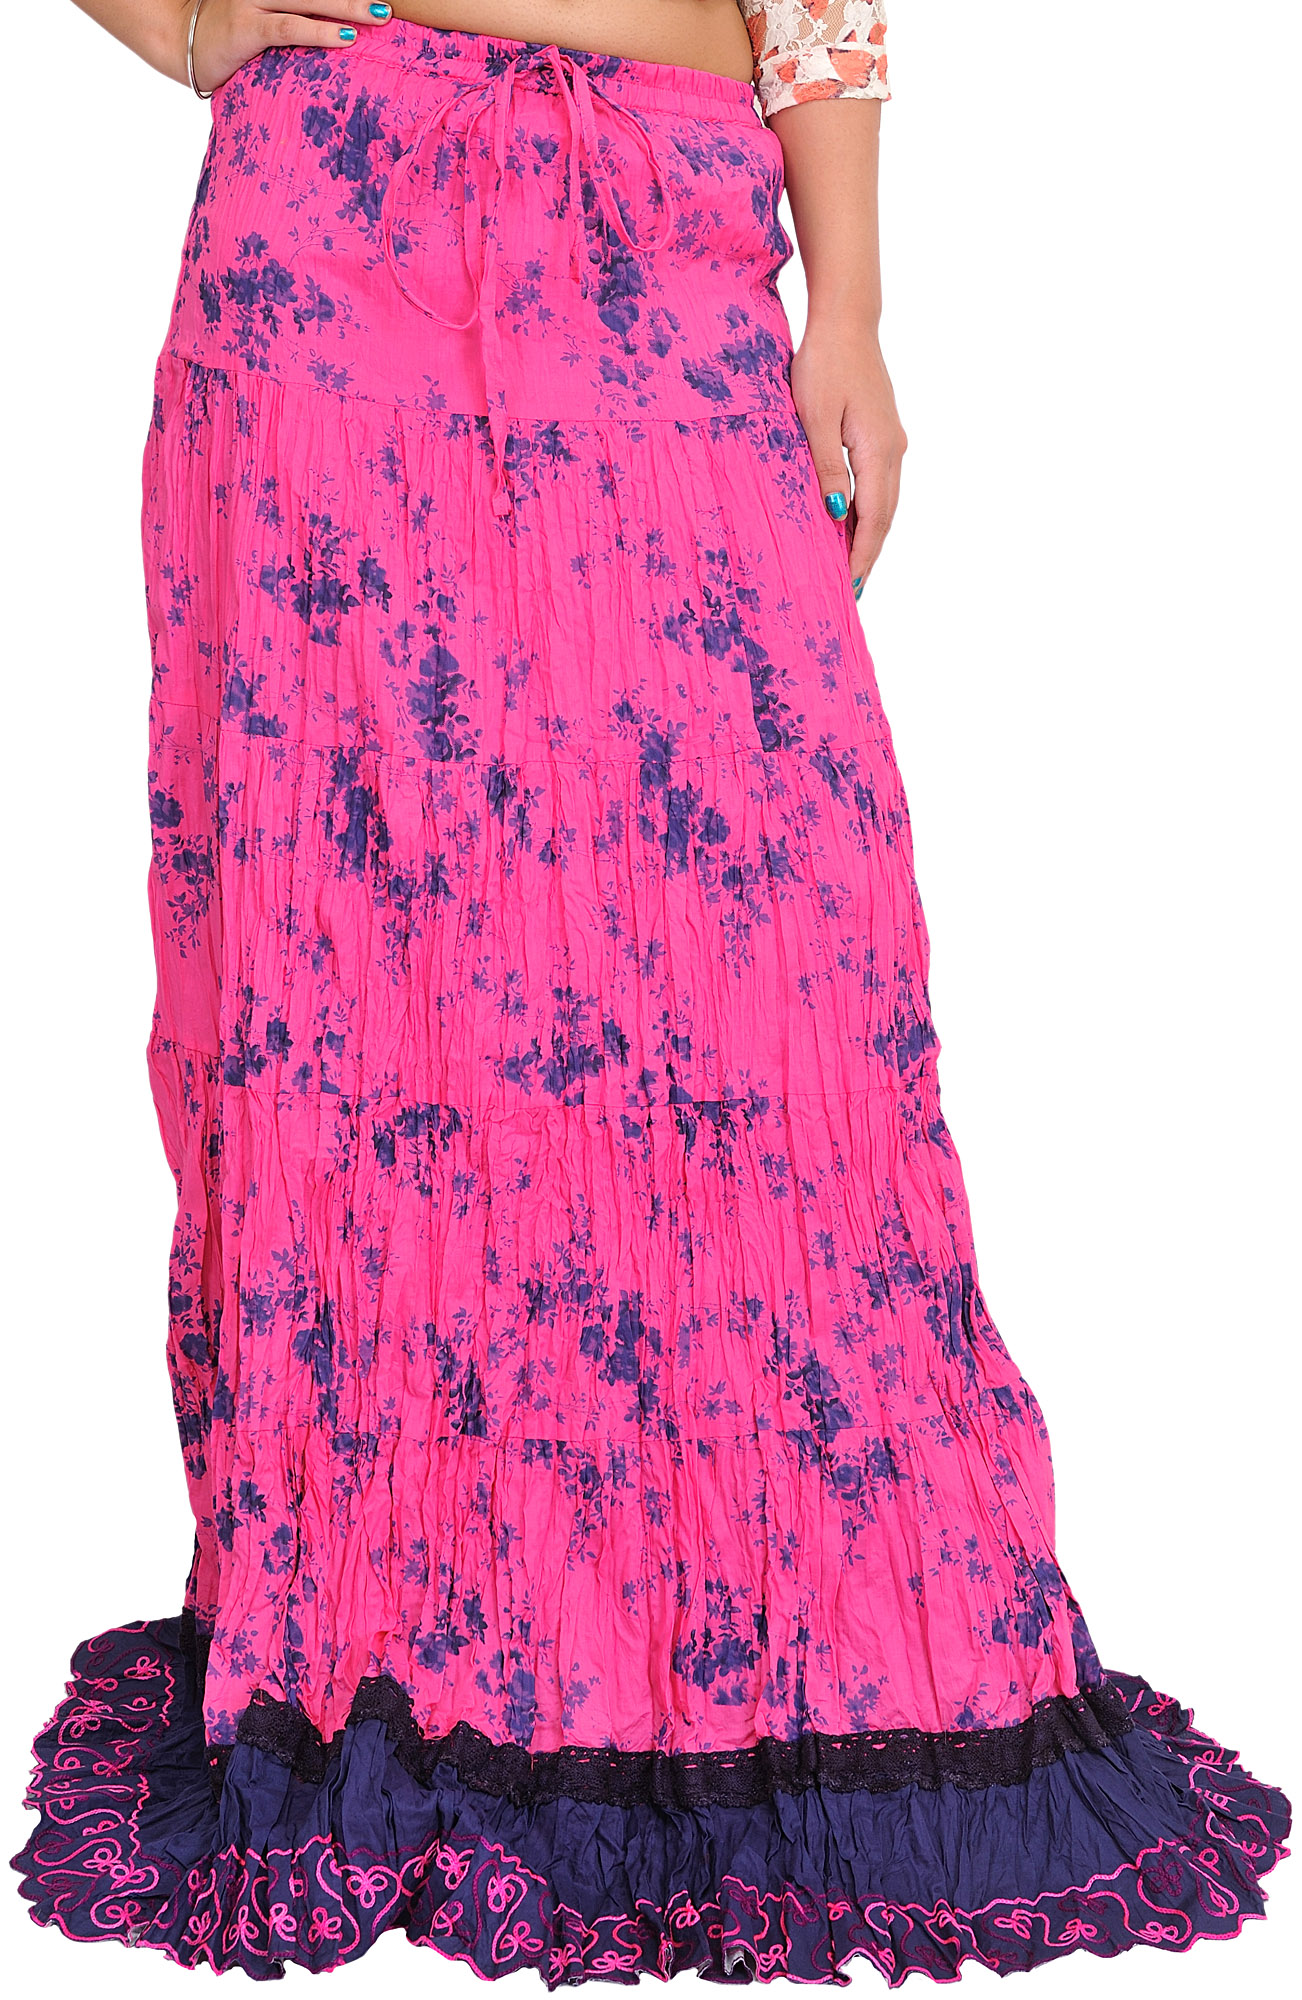 azalea pink and blue floral printed crinkled skirt